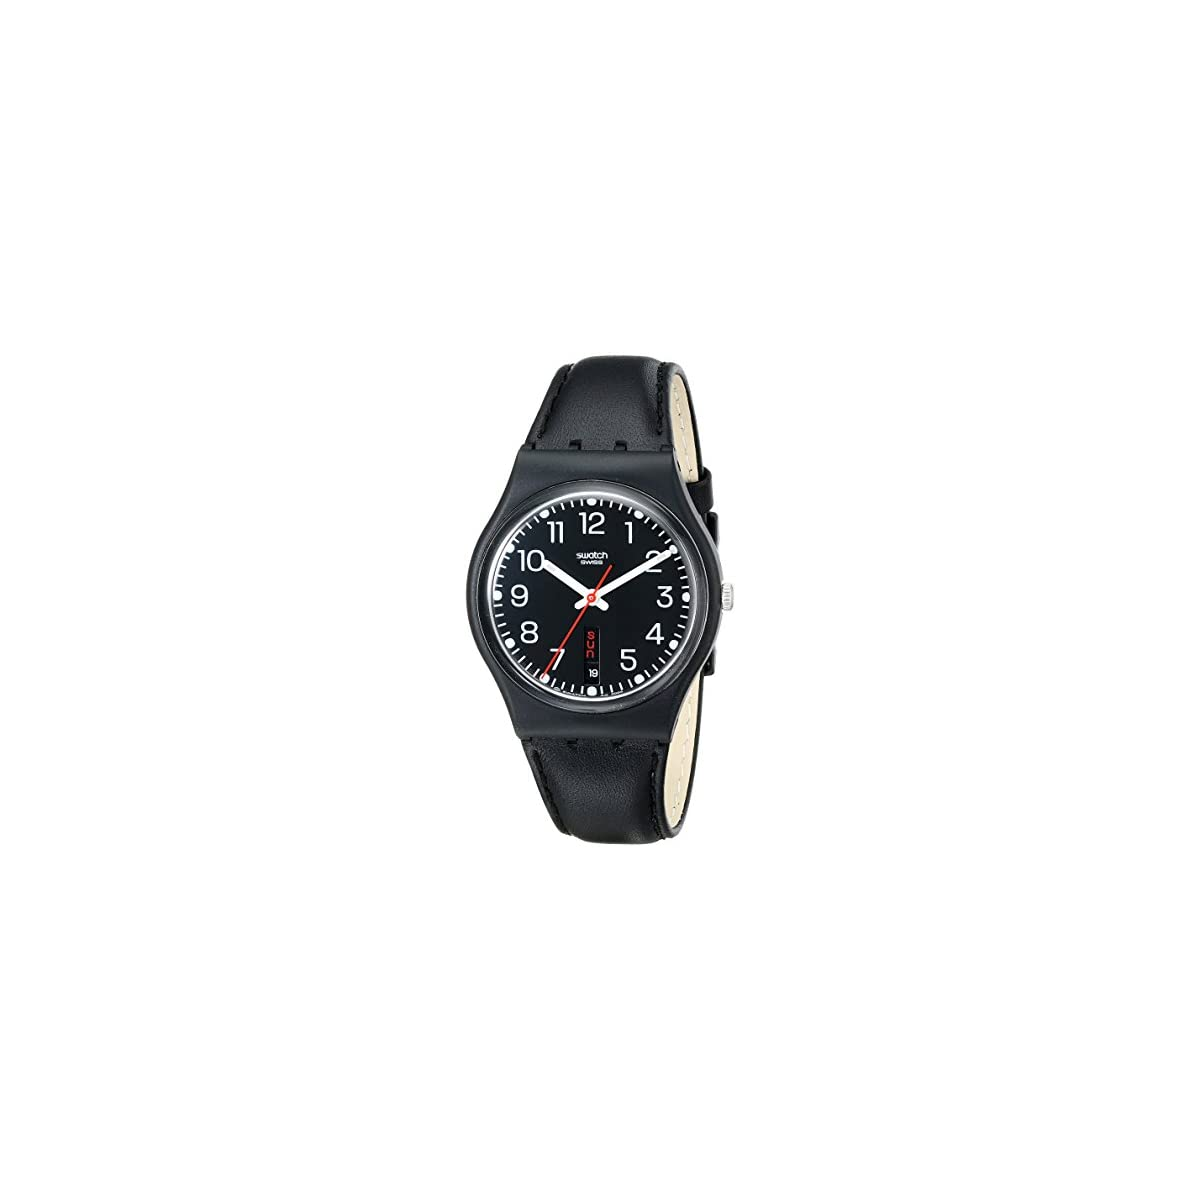 51Lt5IqxnTL. SS1200  - Swatch Gent Red Sunday GB 750 - Reloj Unisex de Cuarzo, Correa de Piel Color Negro